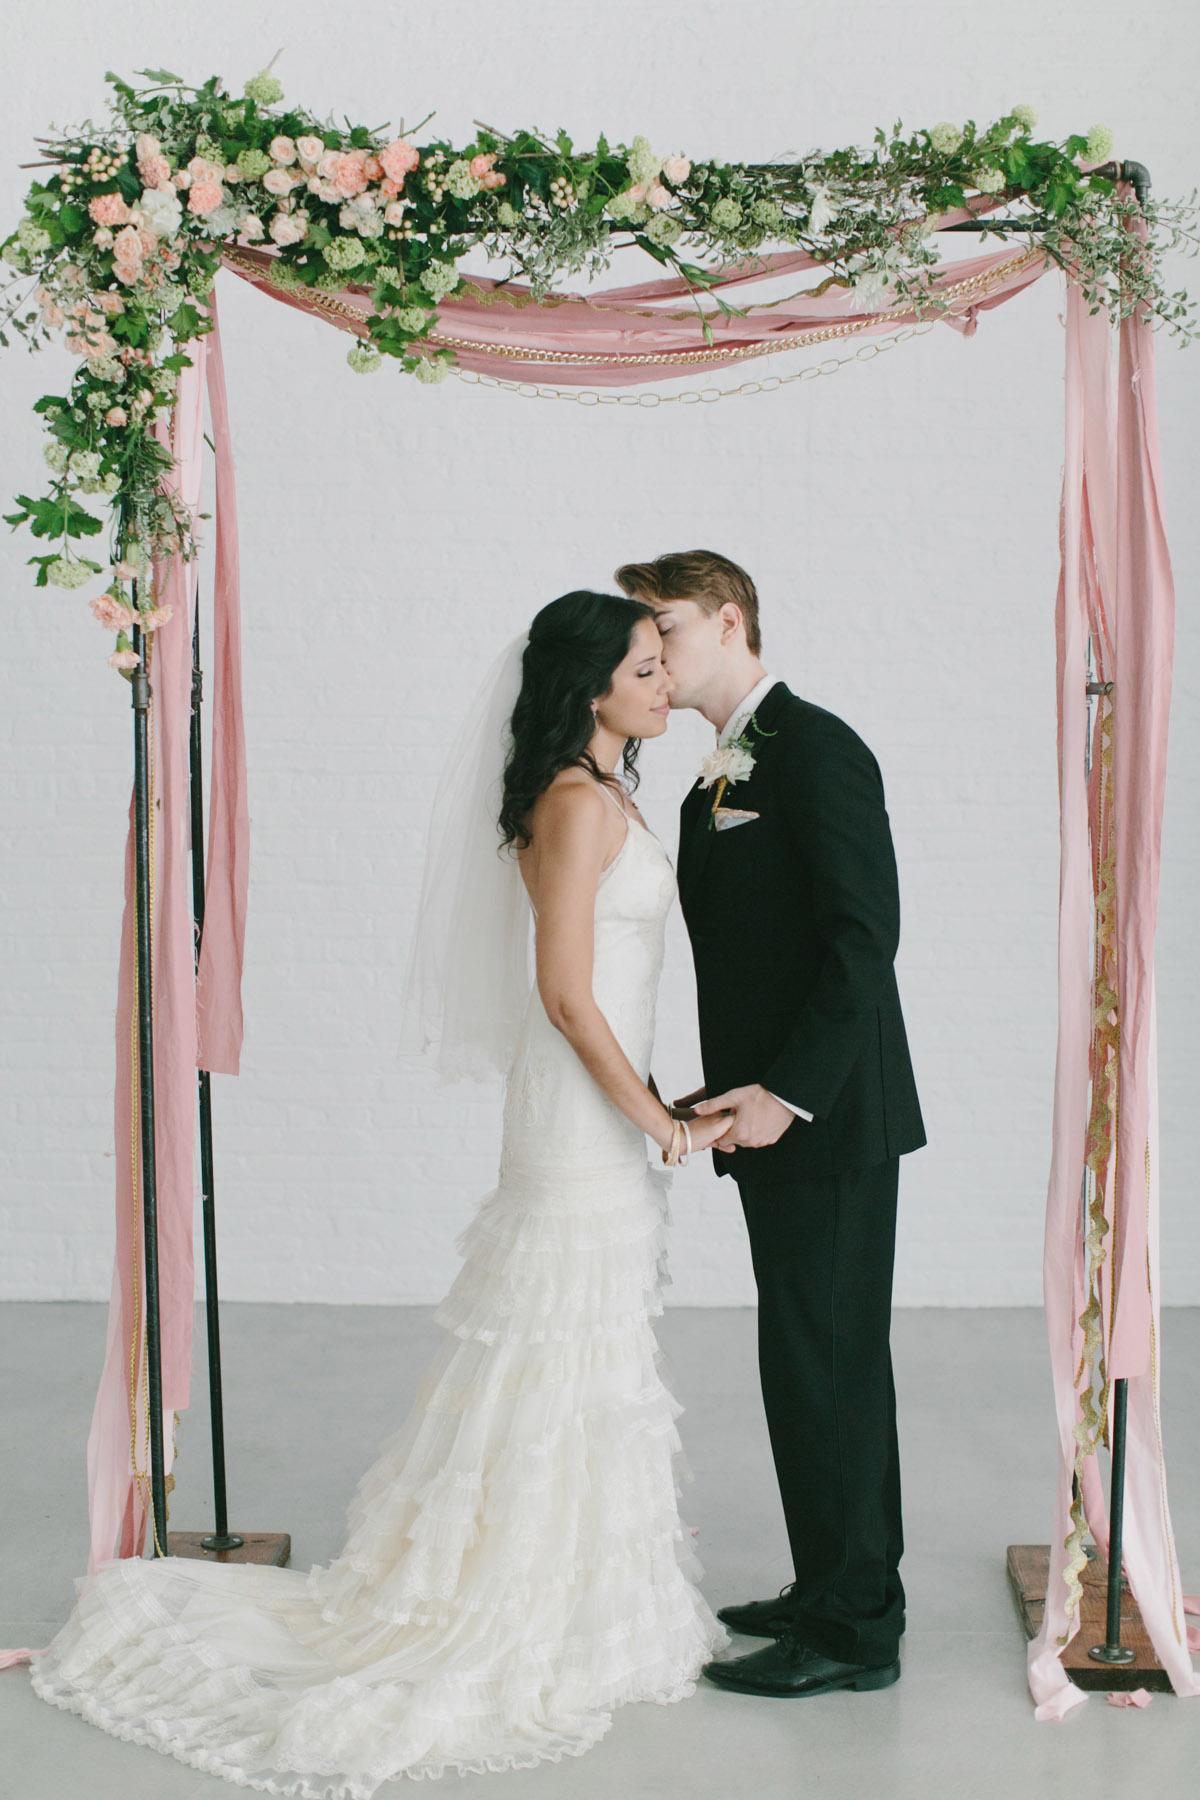 Chez Chicago Wedding Photography-006.jpg